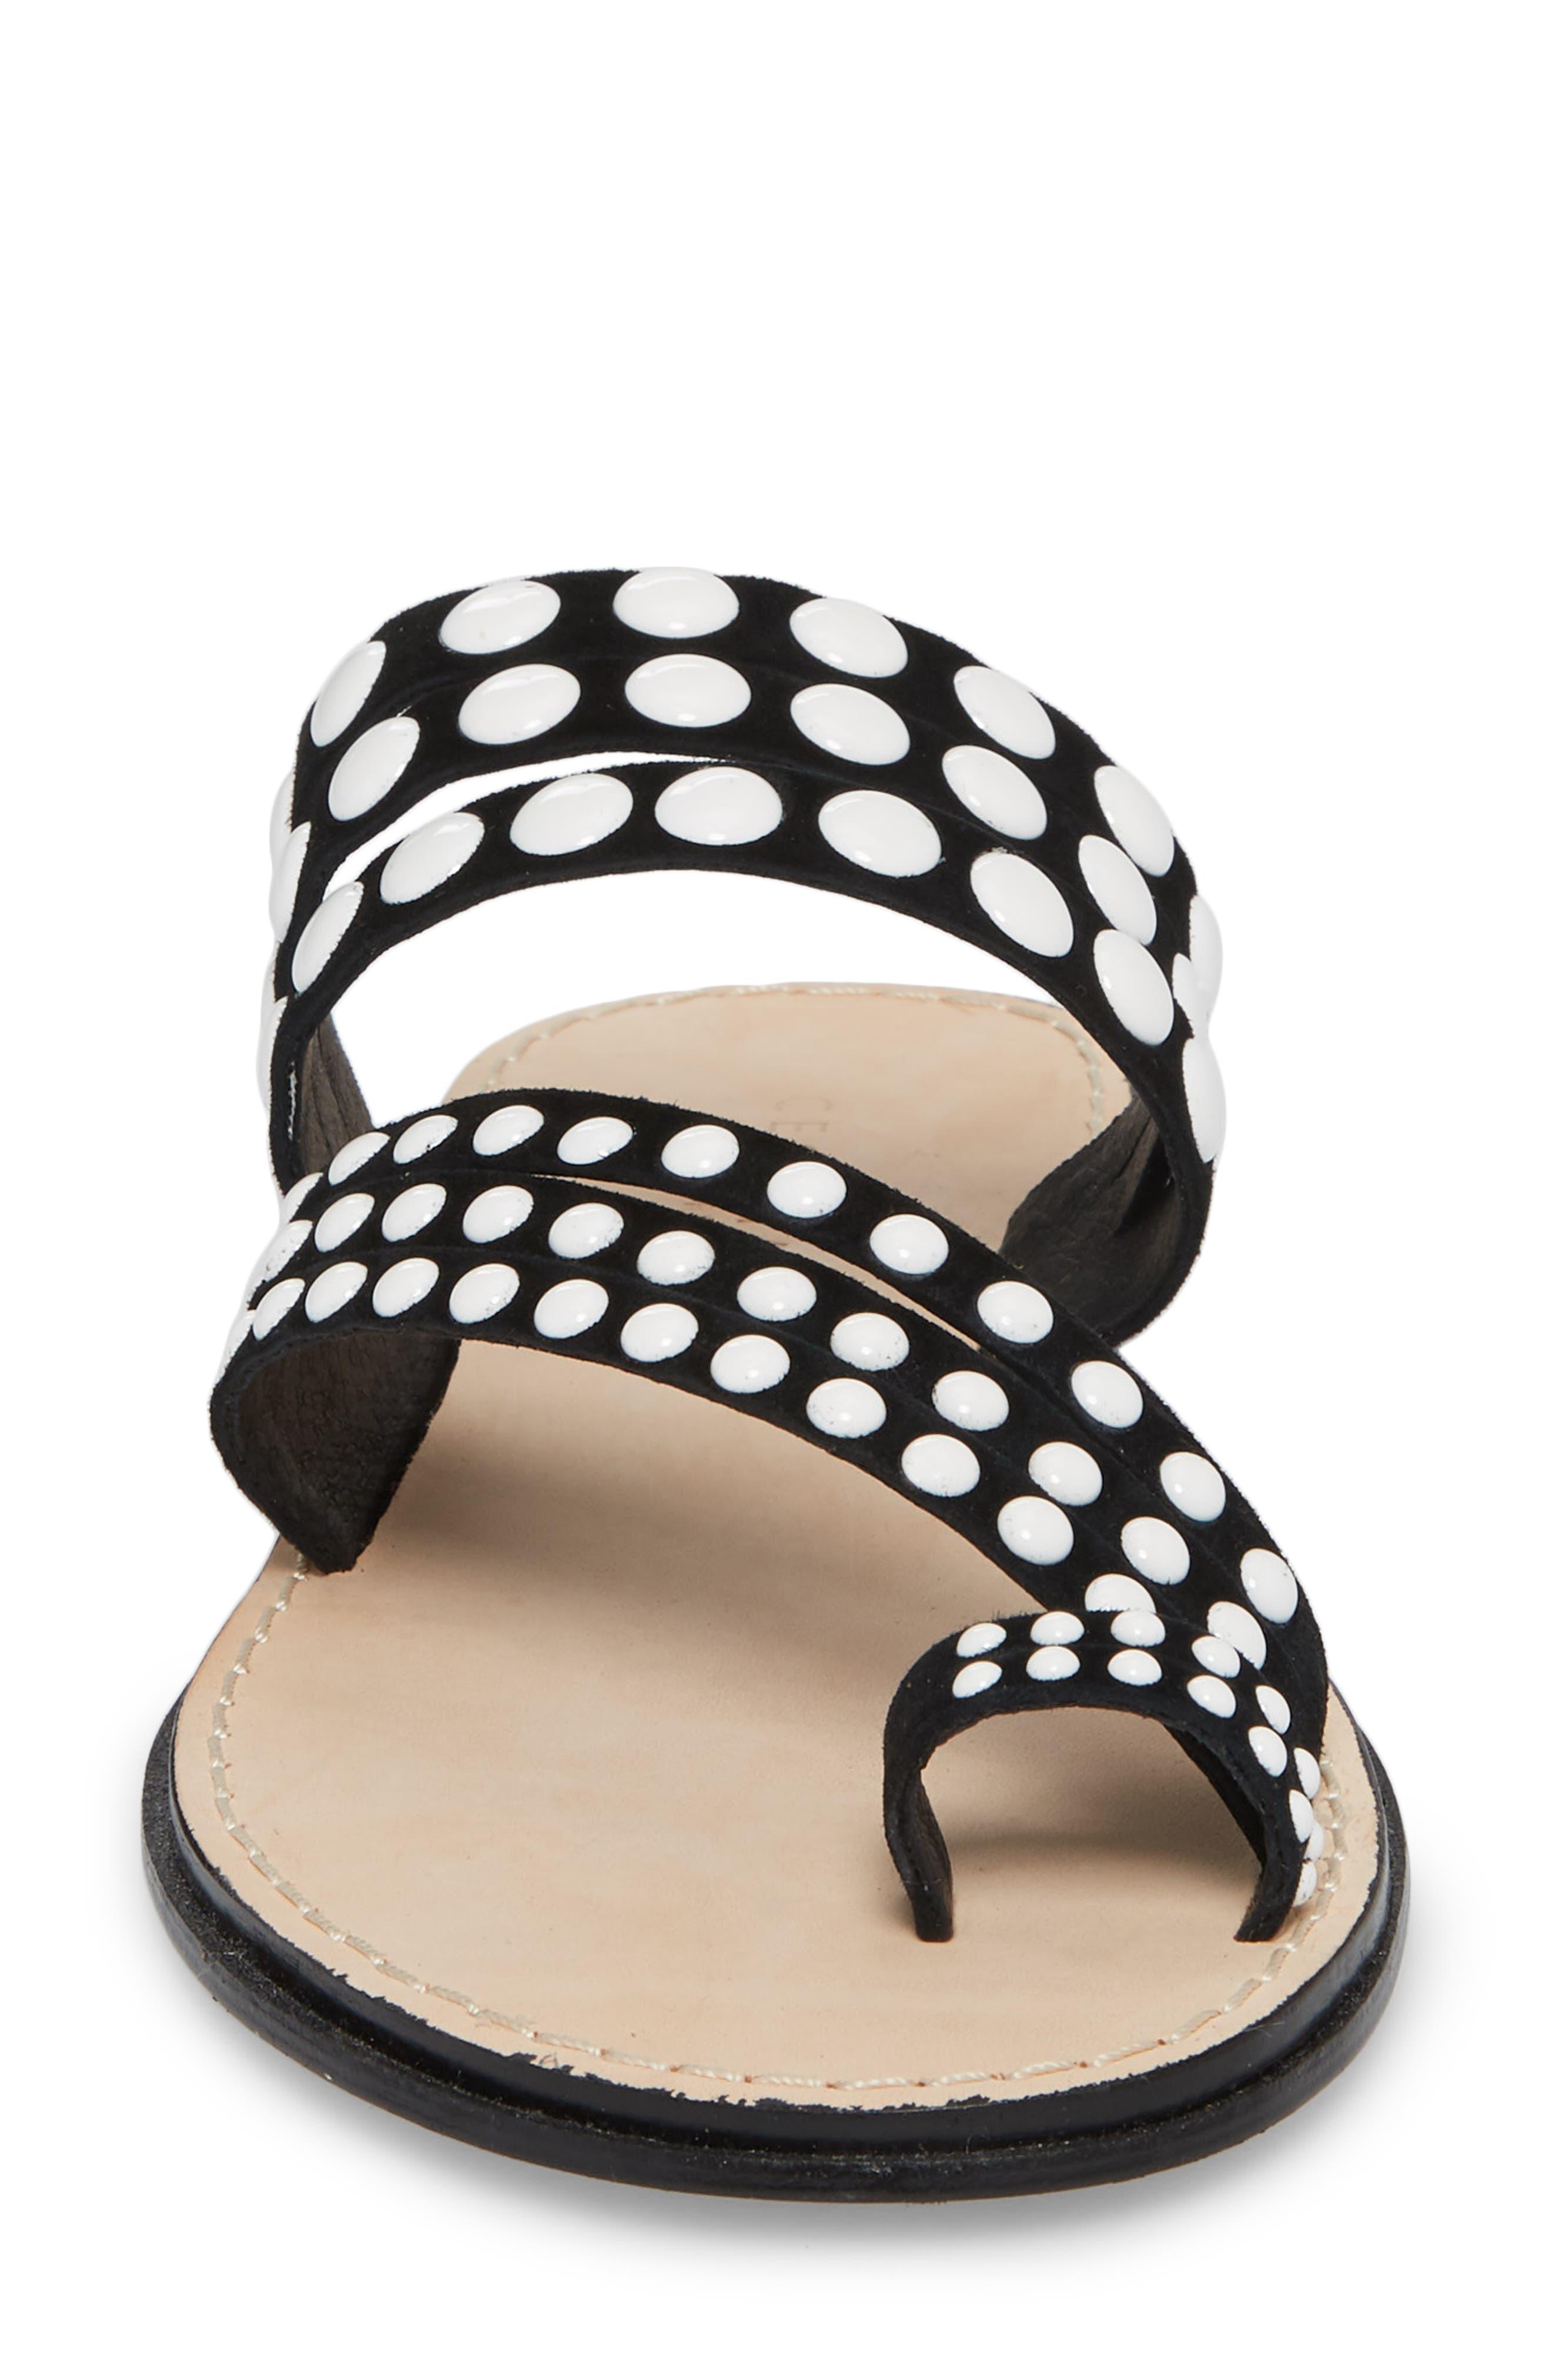 Pezz Studded Sandal,                             Alternate thumbnail 4, color,                             001